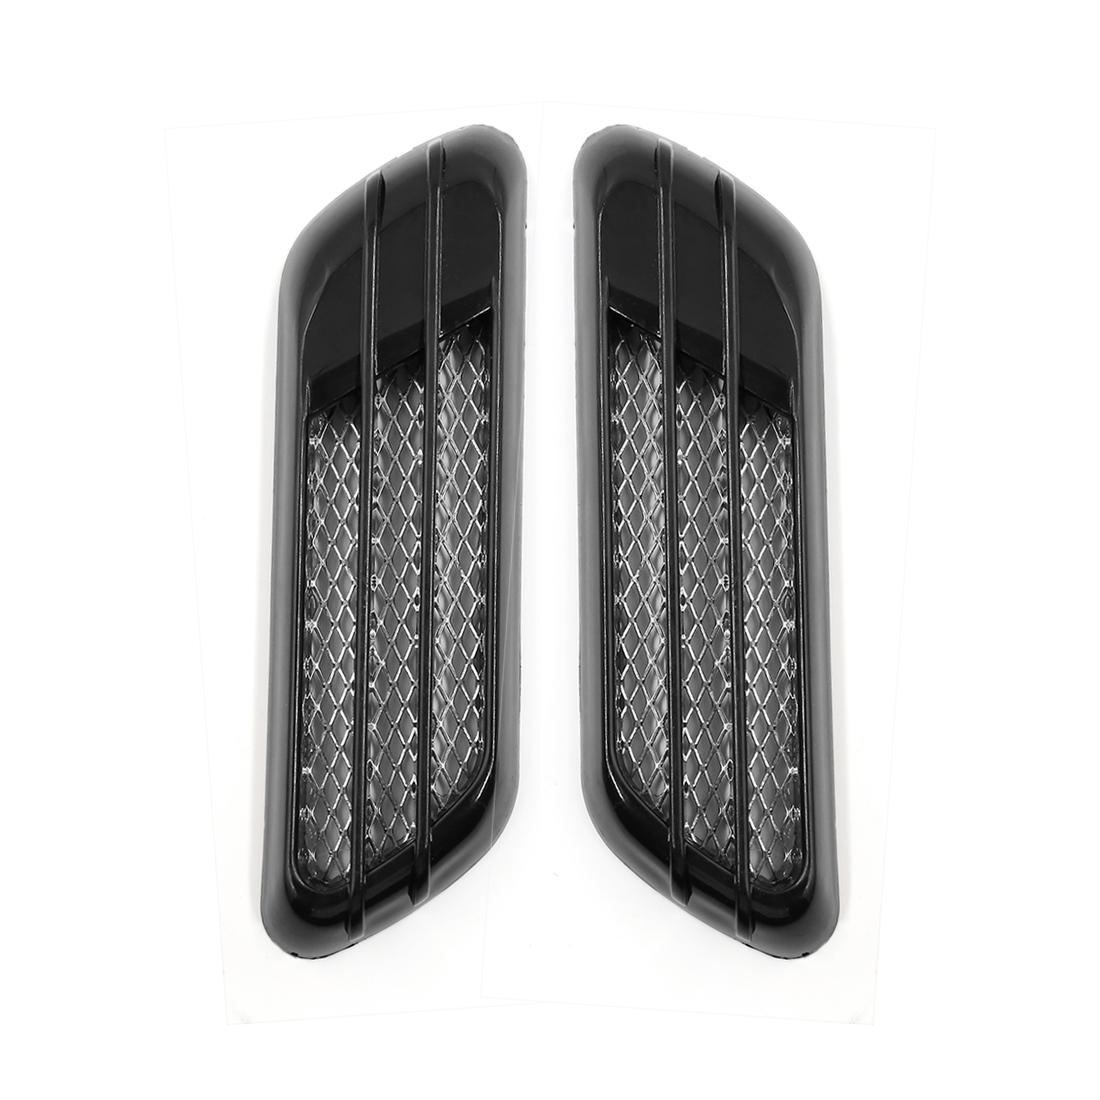 Black Car Air Flow Vent Hood Cover Fender Body Exterior Decoration Stickers 2pcs